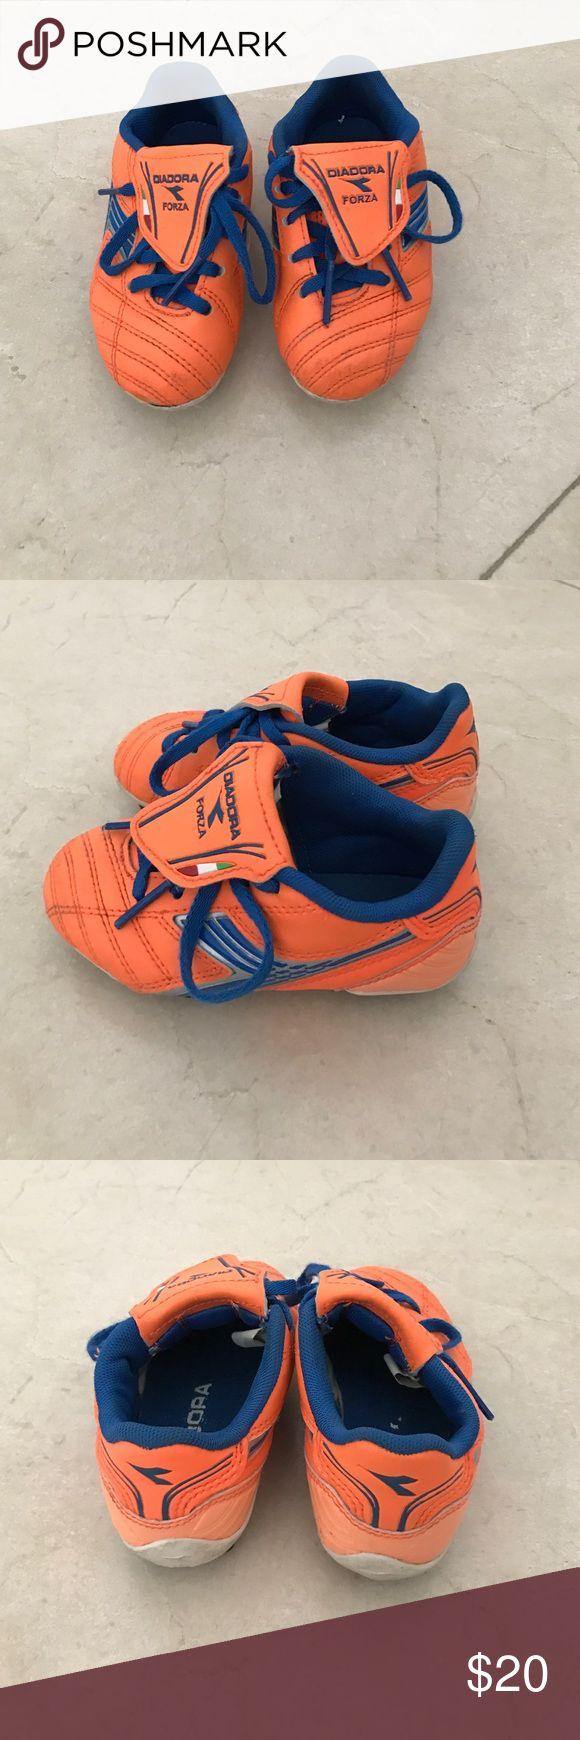 Diadora unisex orange/blue soccer shoes 8.5 Diadora forza unisex orange/blue soccer shoes 8.5 toddler. In great condition!! Diadora Shoes Sneakers